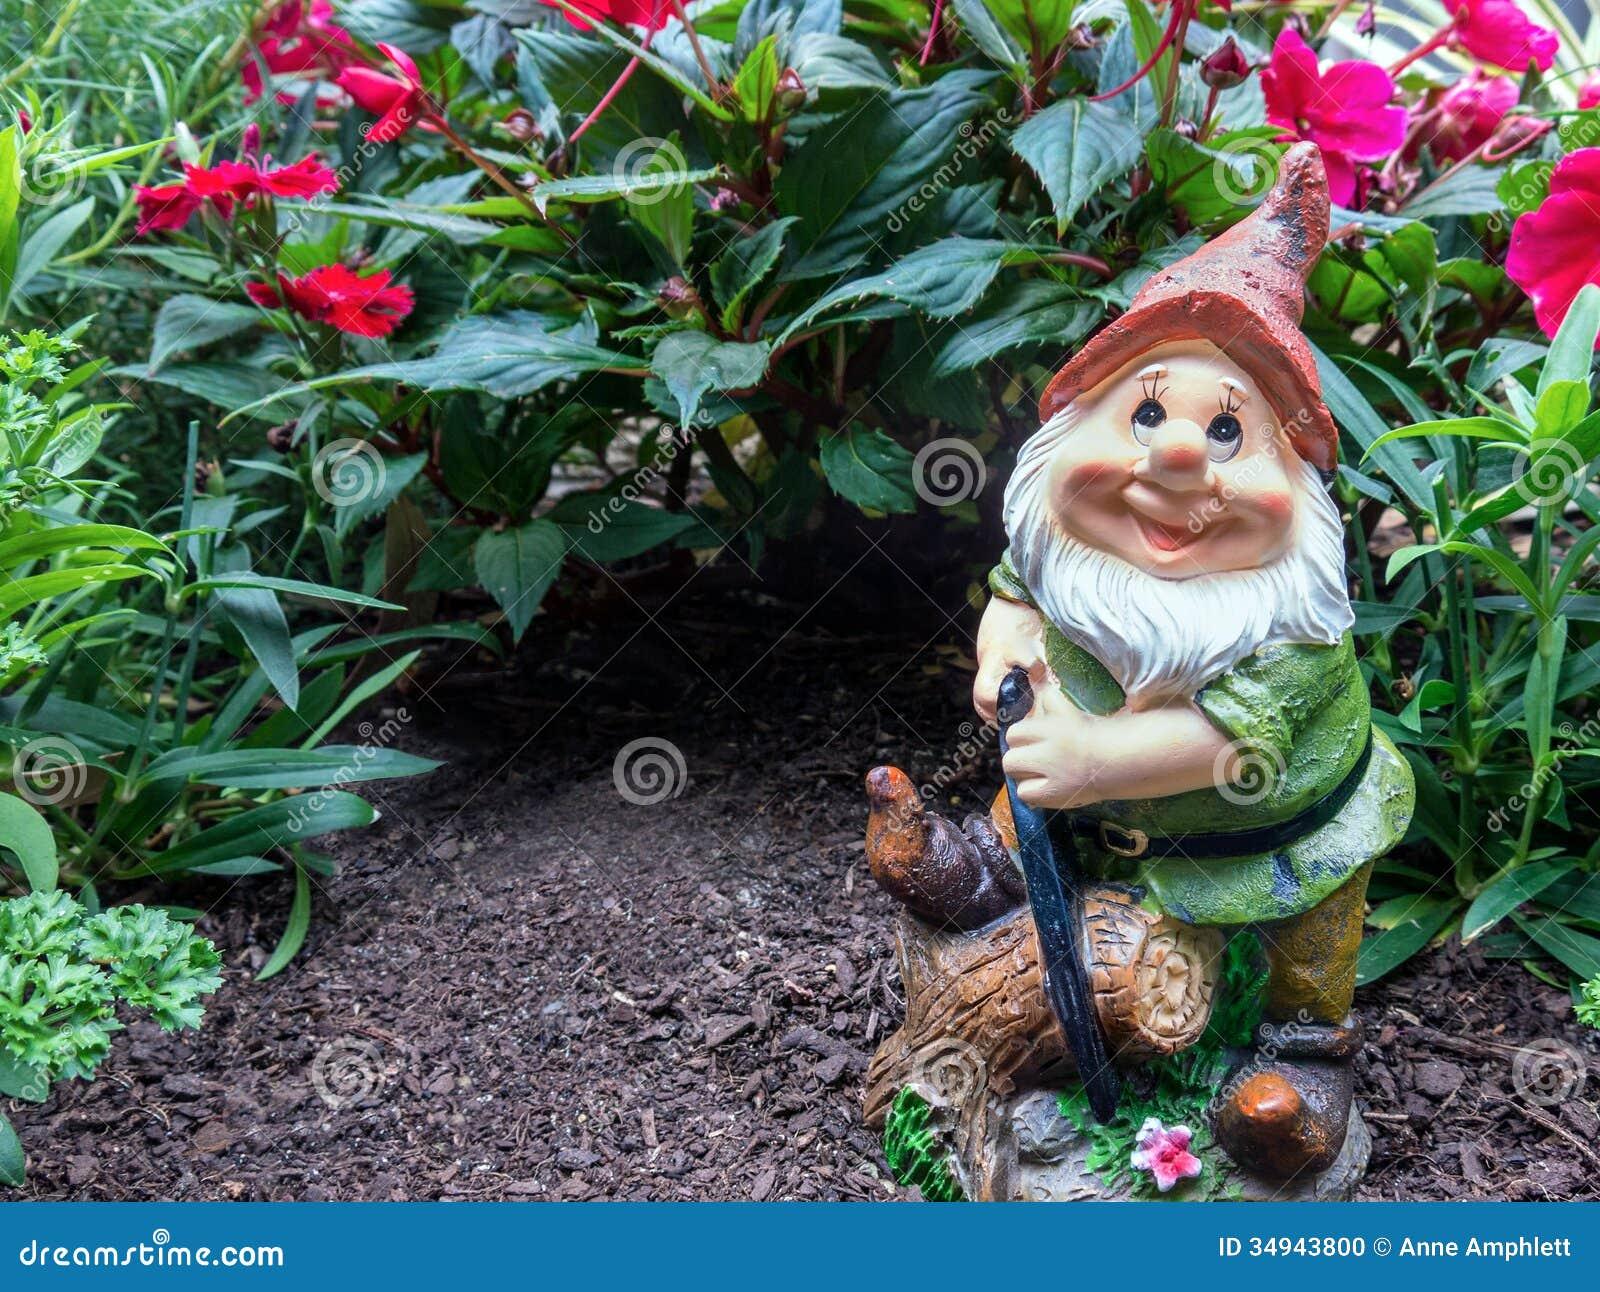 Gnome In Garden: Garden Gnome Stock Photo. Image Of Novelty, Happy